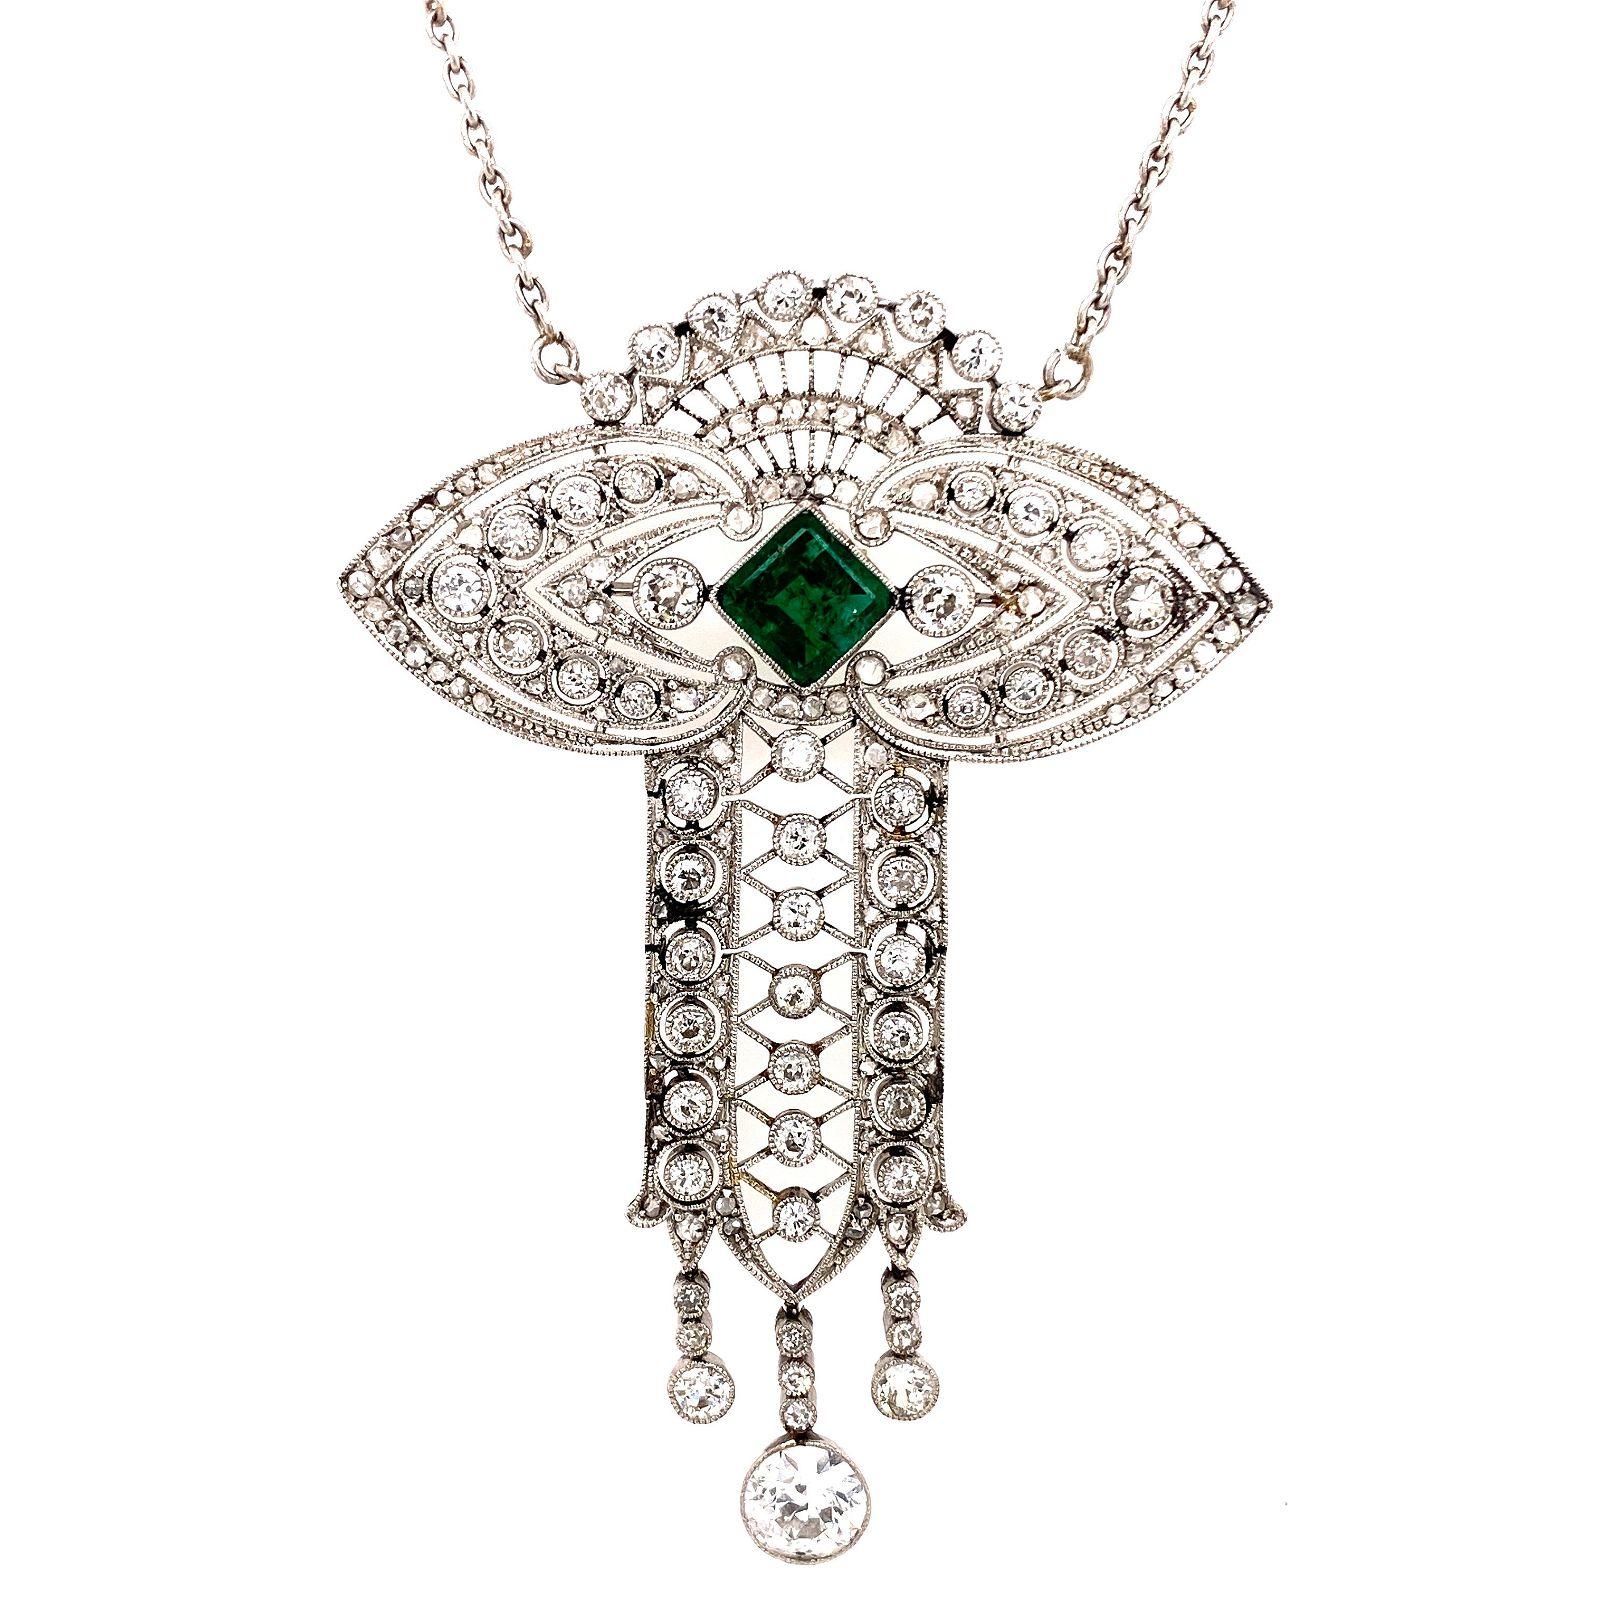 Platinum, Diamond & Emerald Necklace